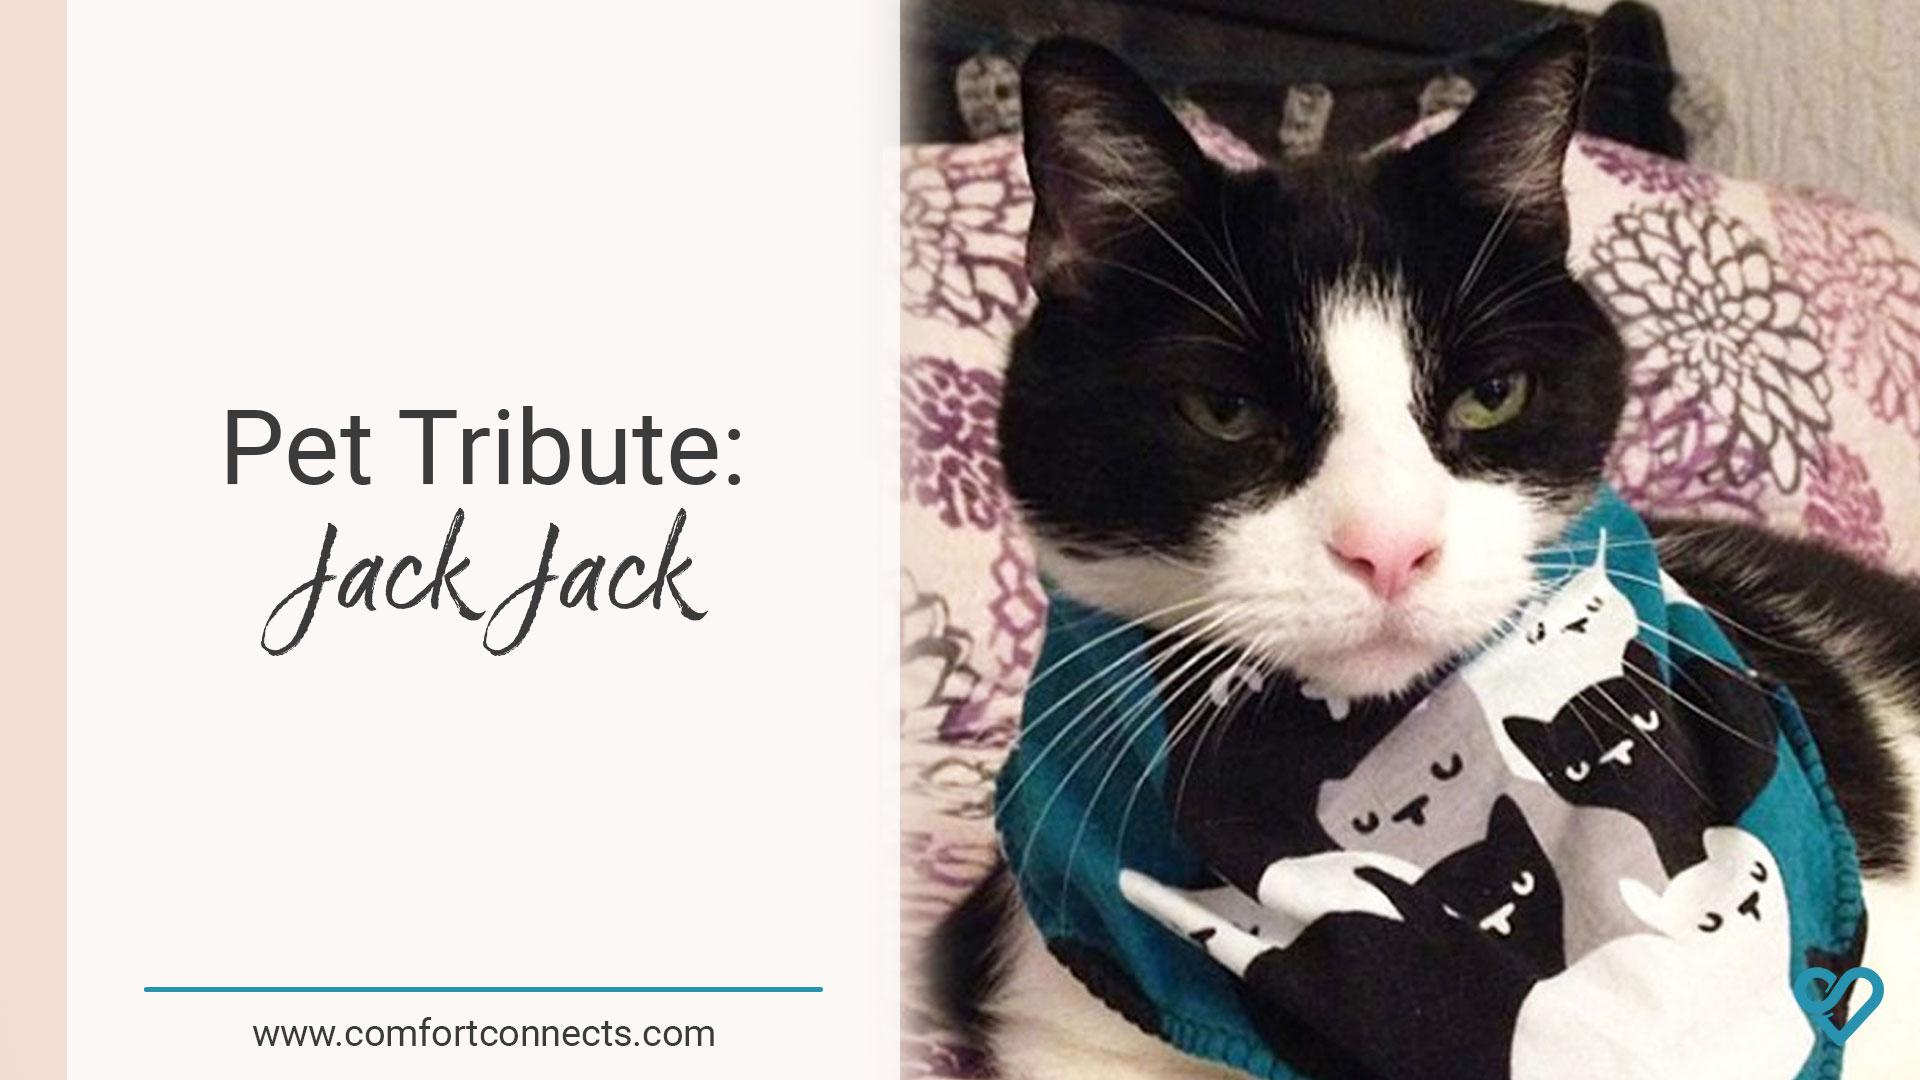 Pet Tribute: Jack Jack